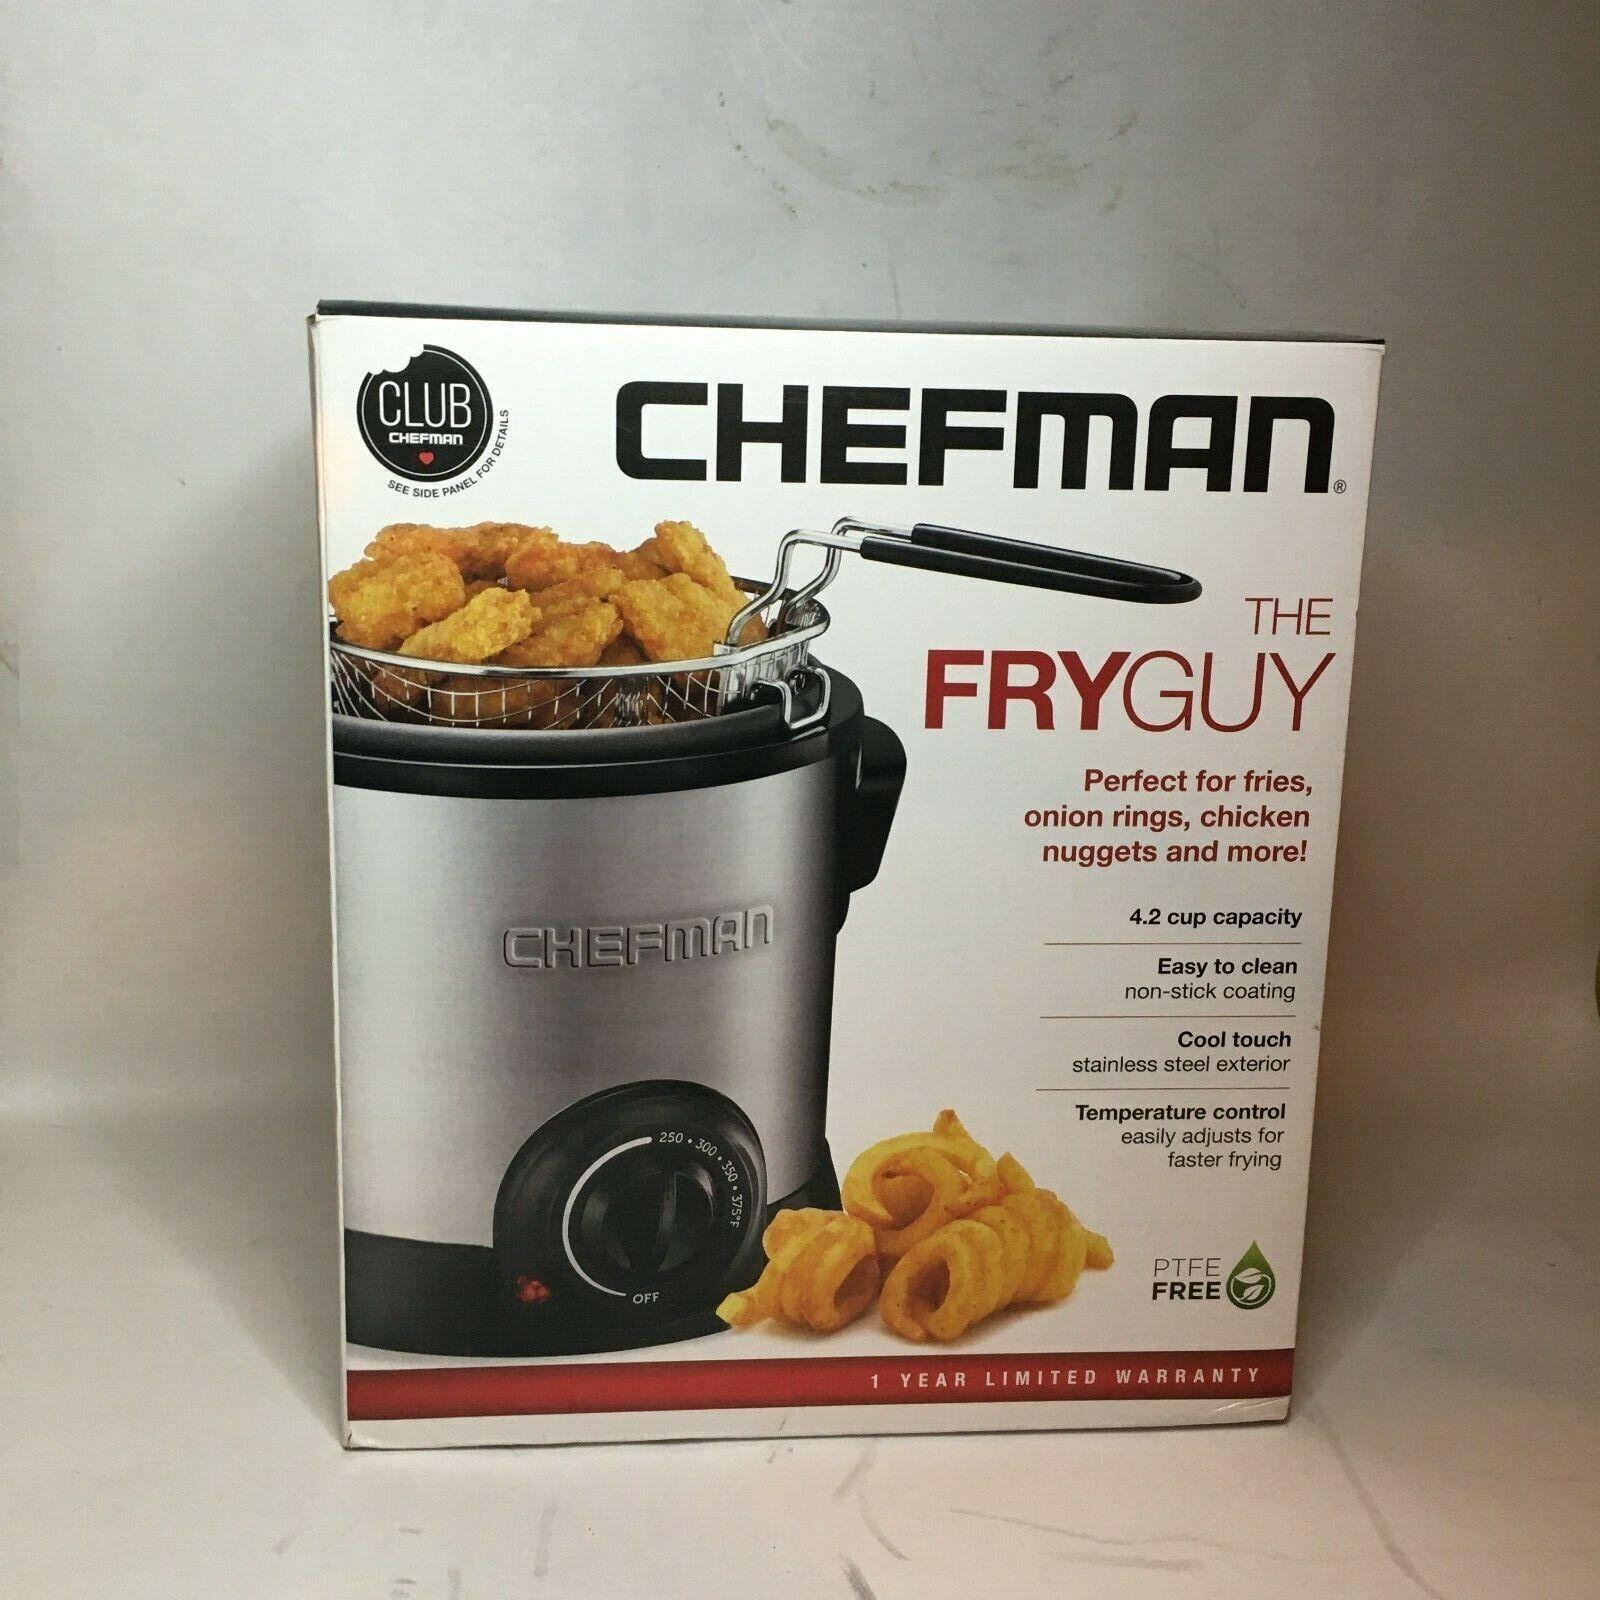 Mini Deep Fryer: Chefman Fry Guy Deep Fryer with Removable B